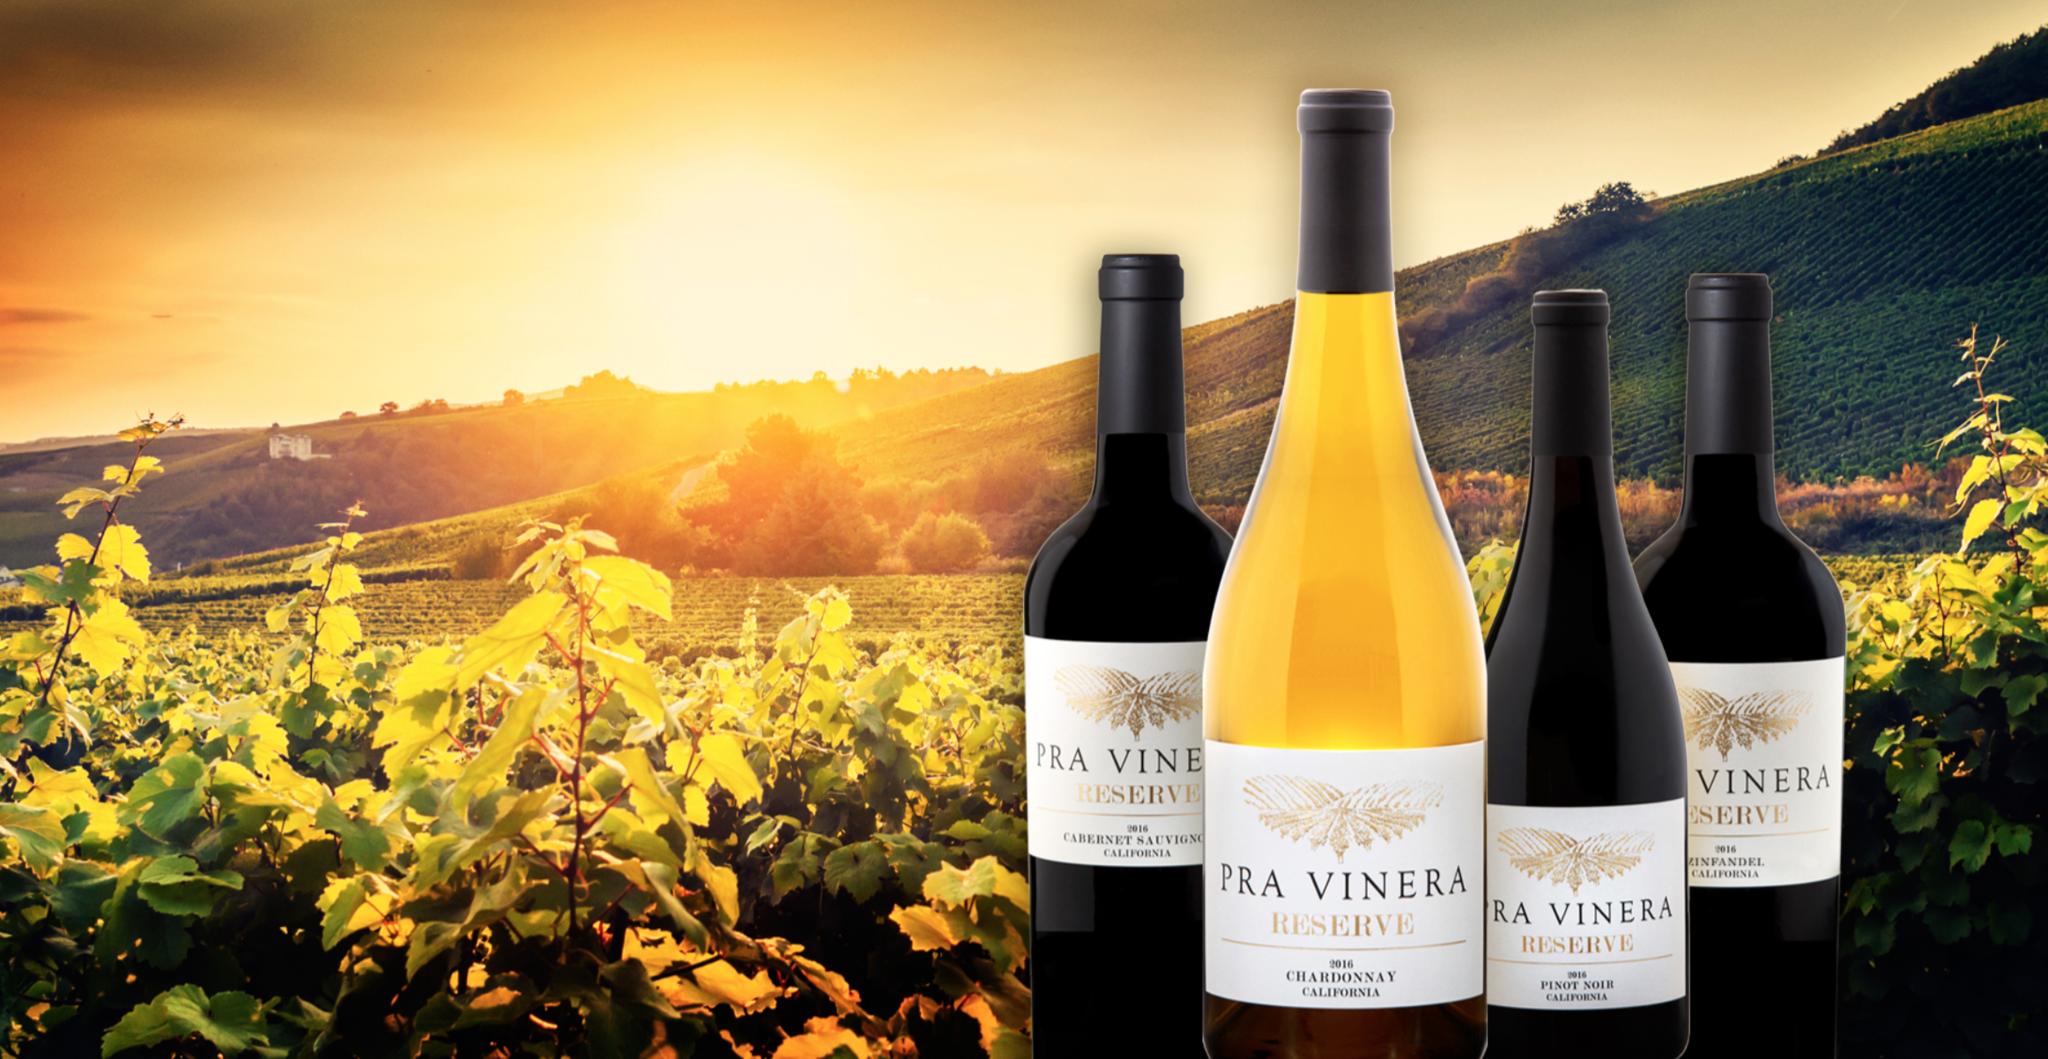 Pra Vinera Wines Cover Image